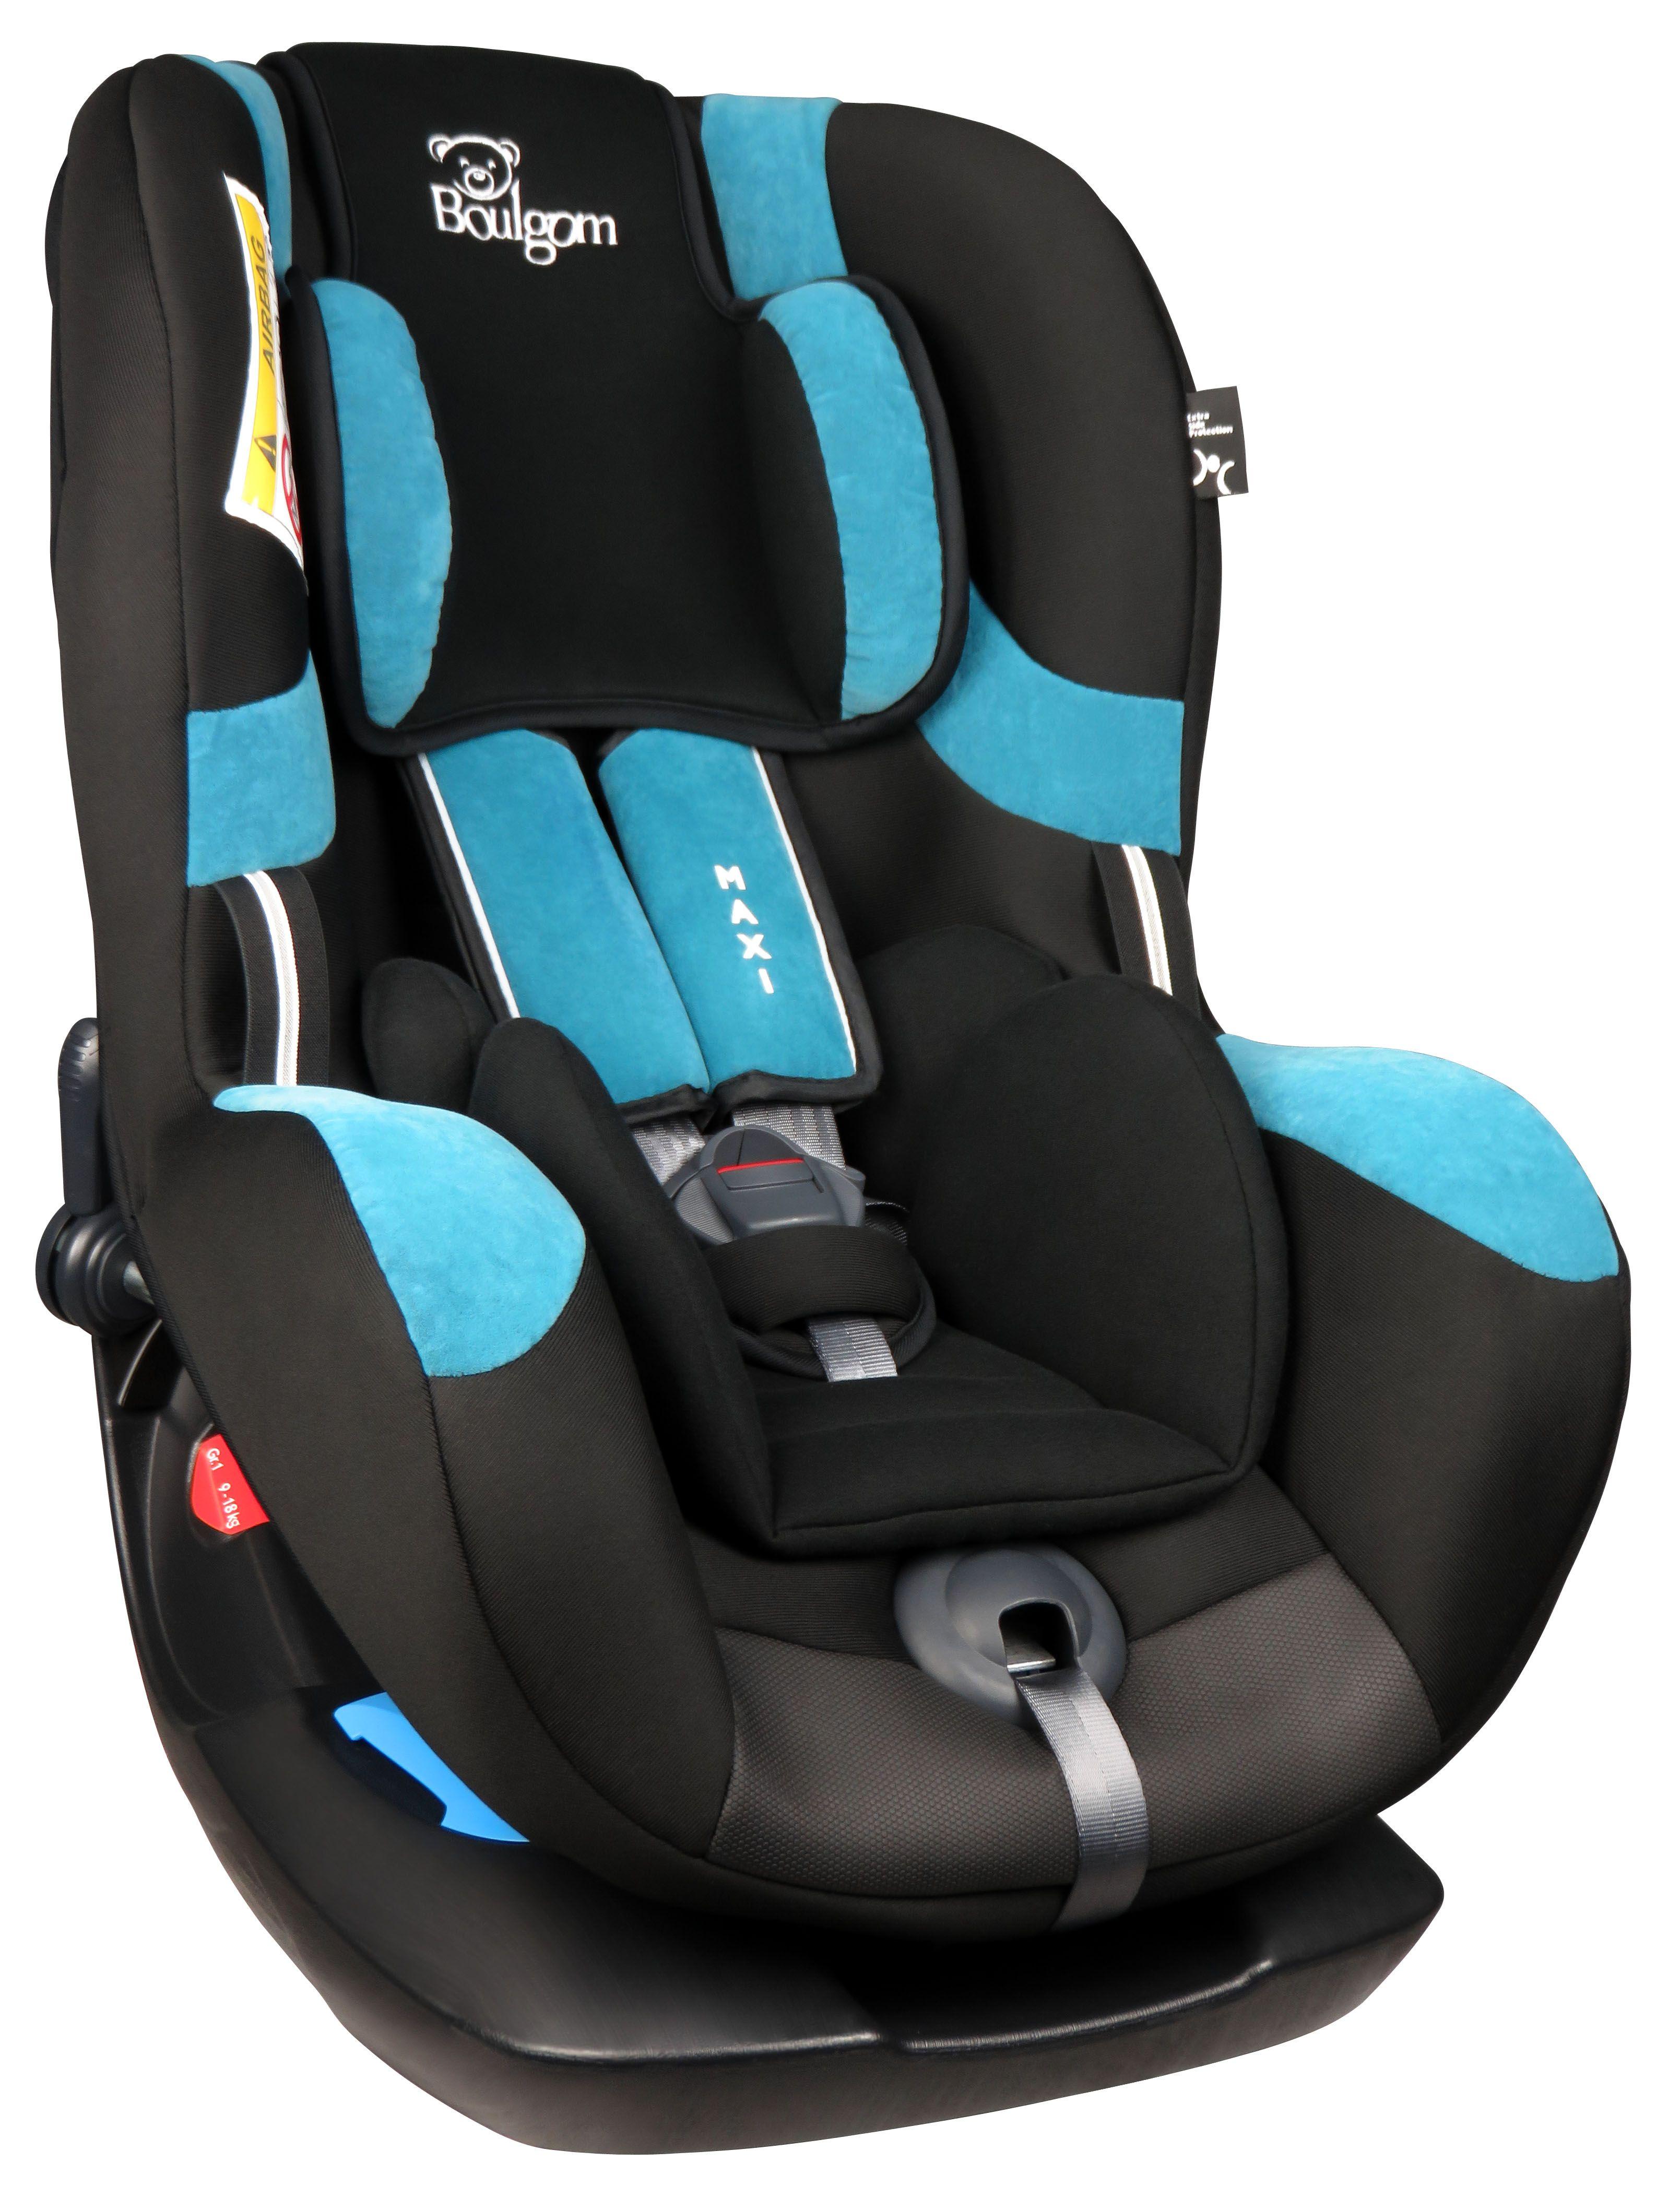 Siège auto MaxiConfort 3 BOULGOM